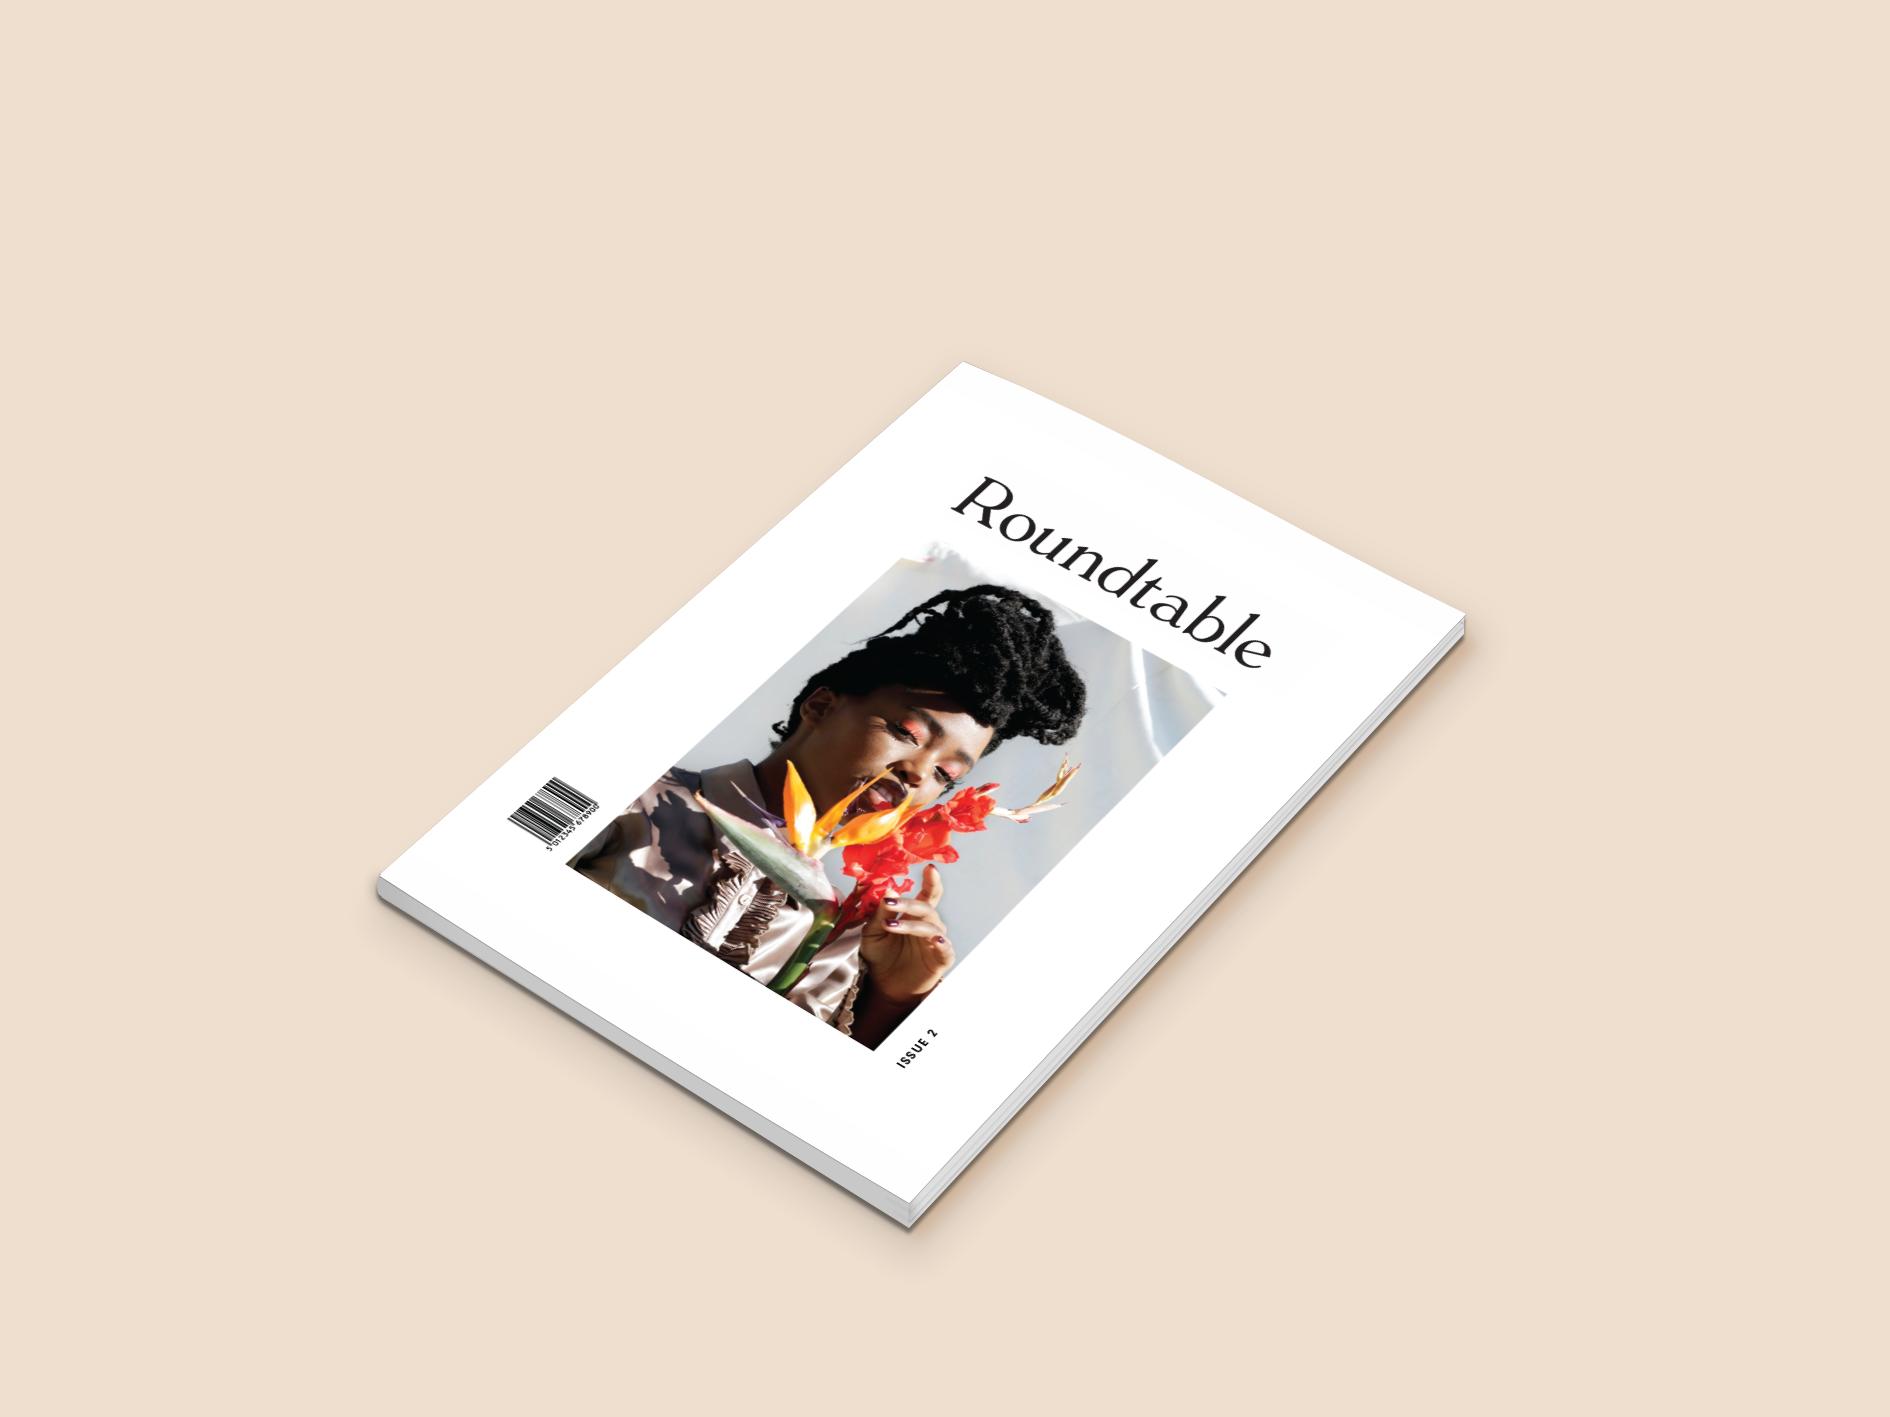 roundtable_mag_mockup_07182017.png